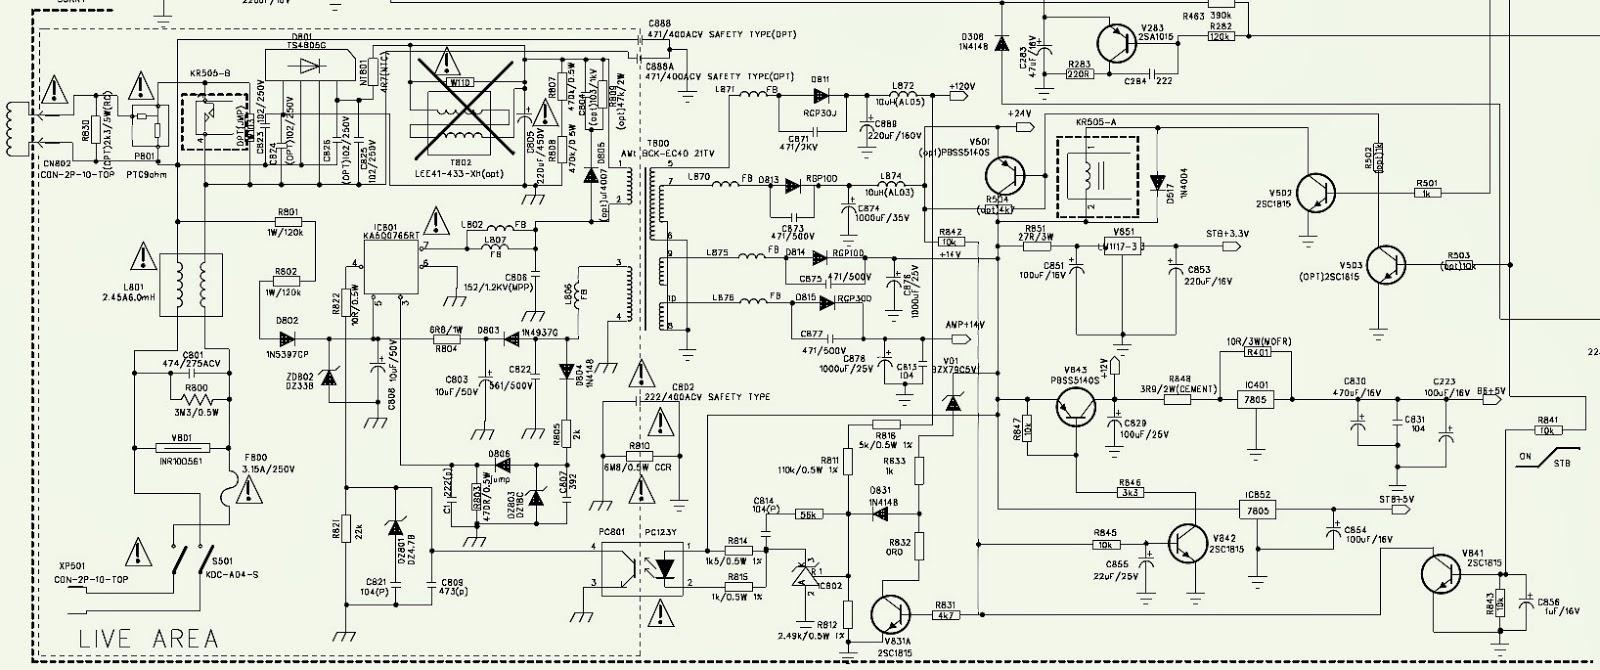 NORDMENDE N2121  VIDEOCON N2121  SCHEMATIC [Circuit